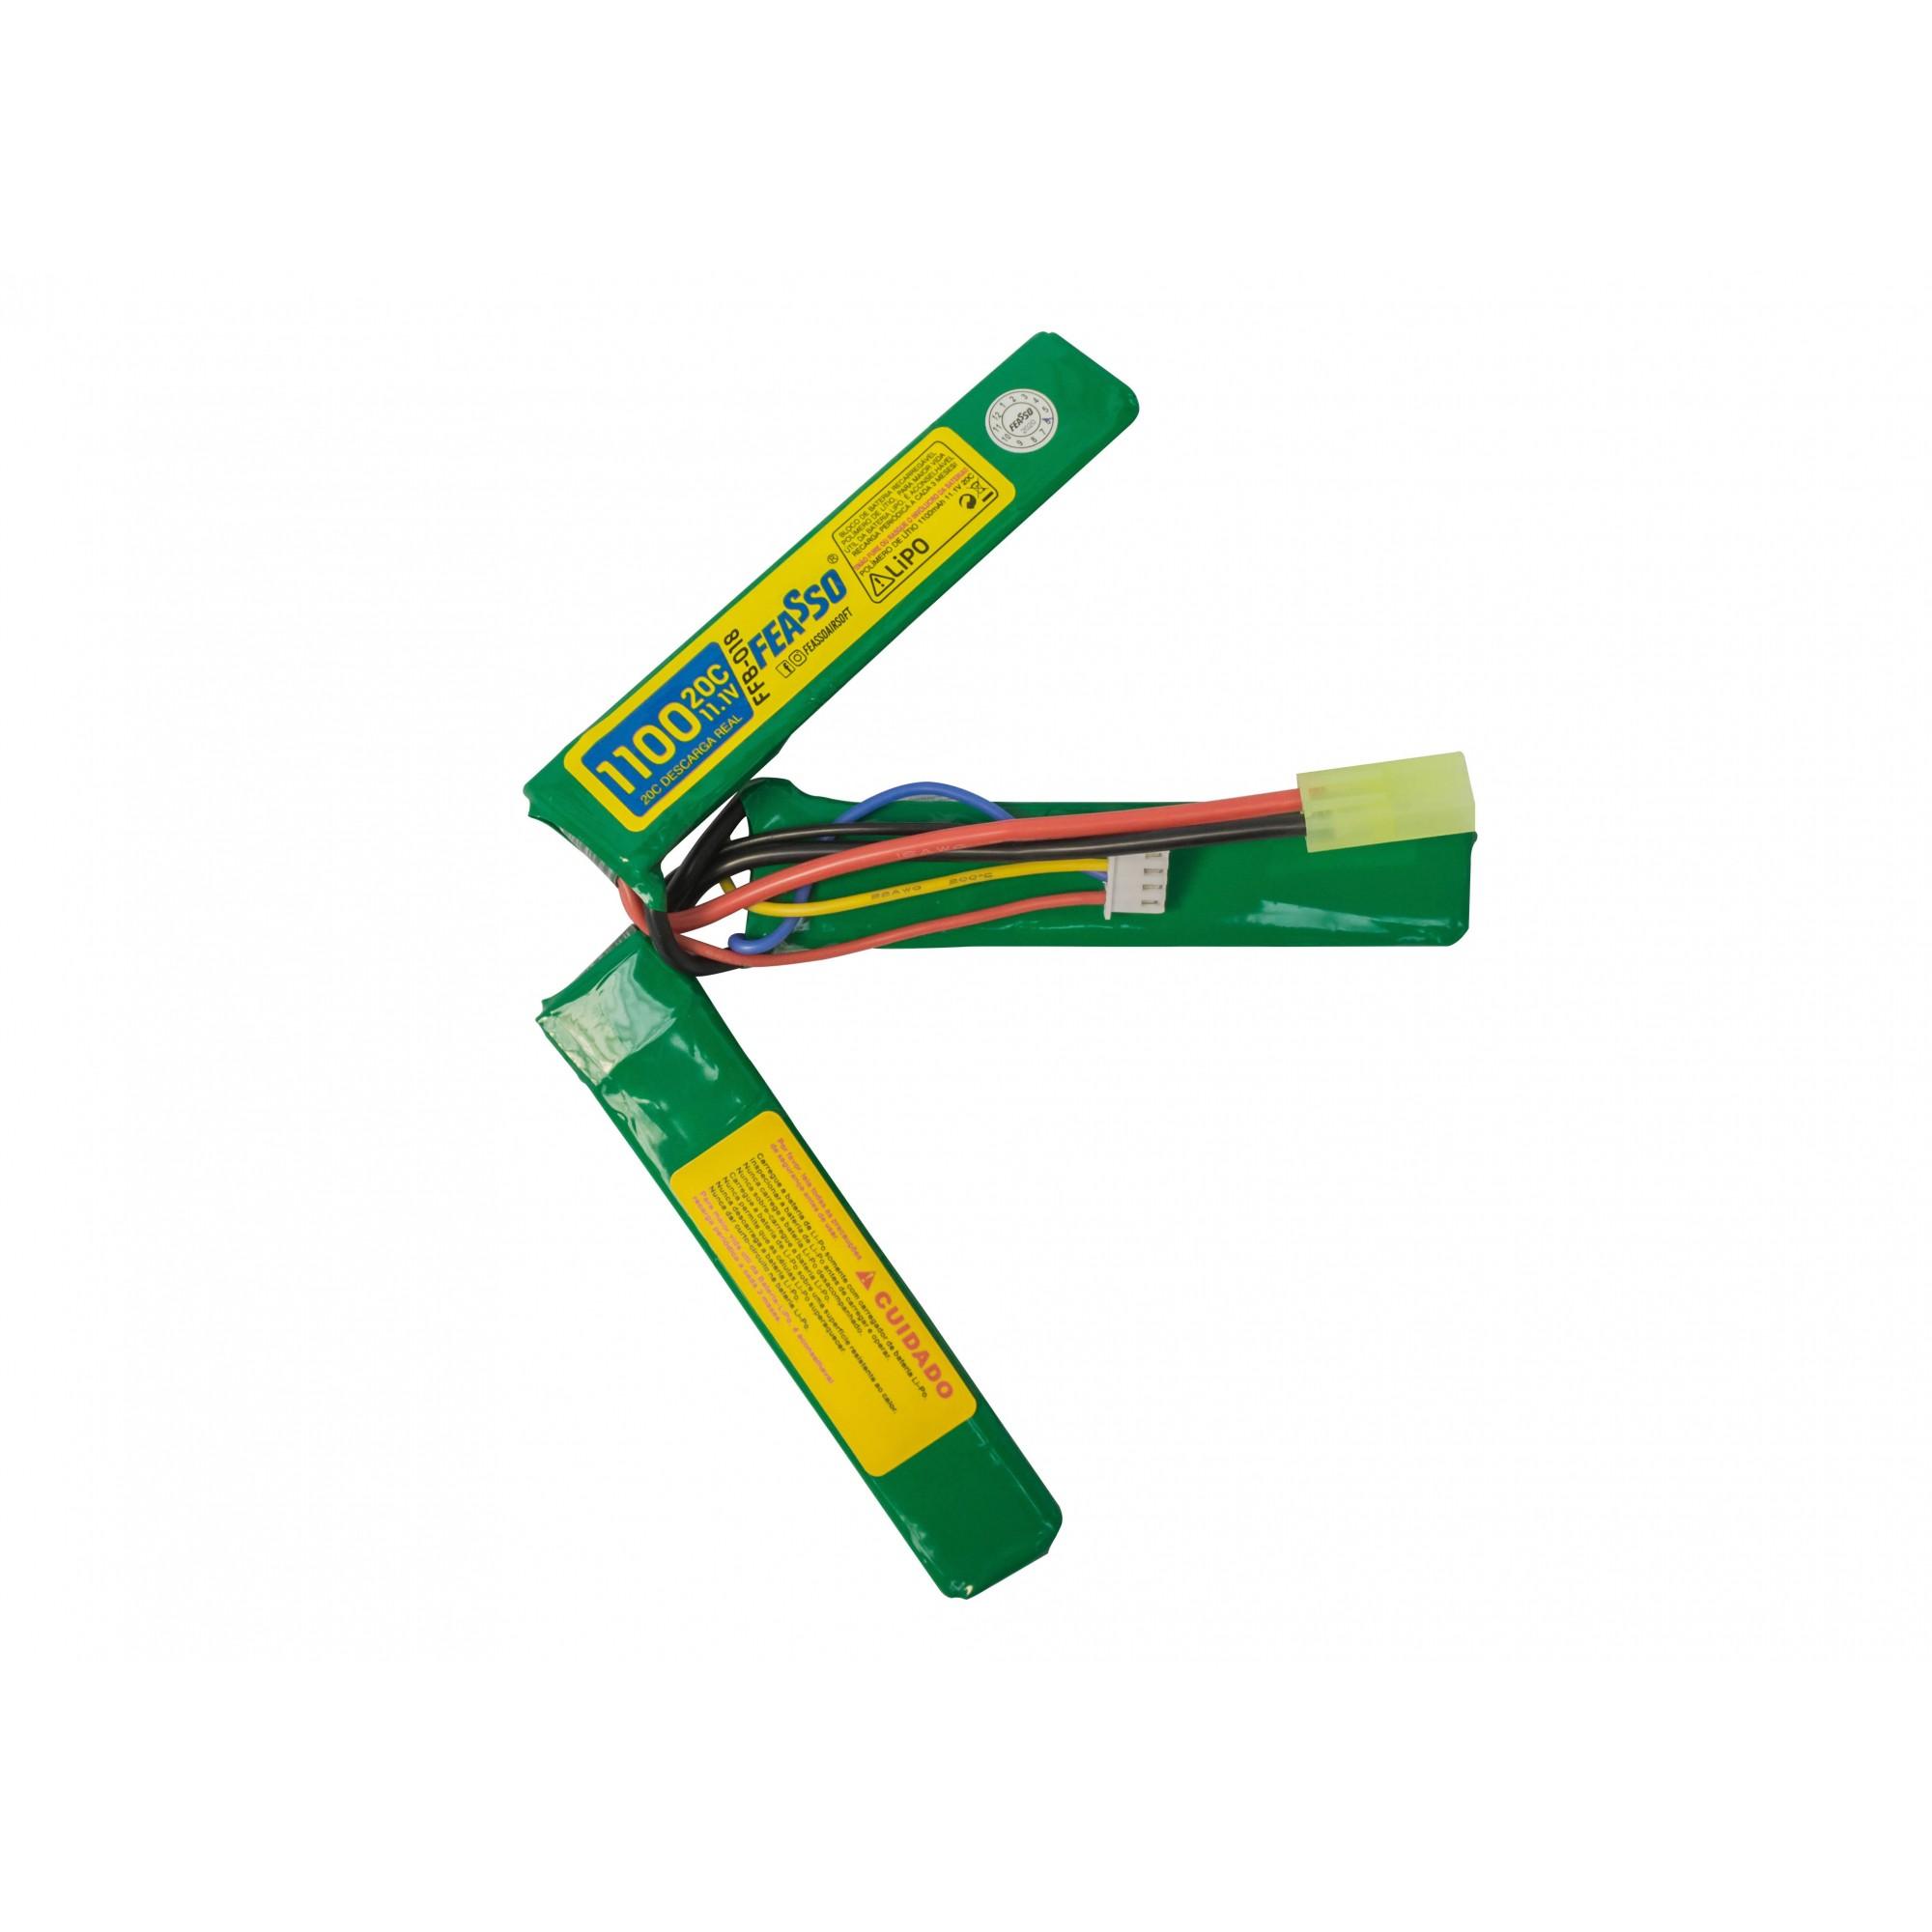 Bateria Lipo Para Airsoft 11.1v 1100mah 20c Ffb-018